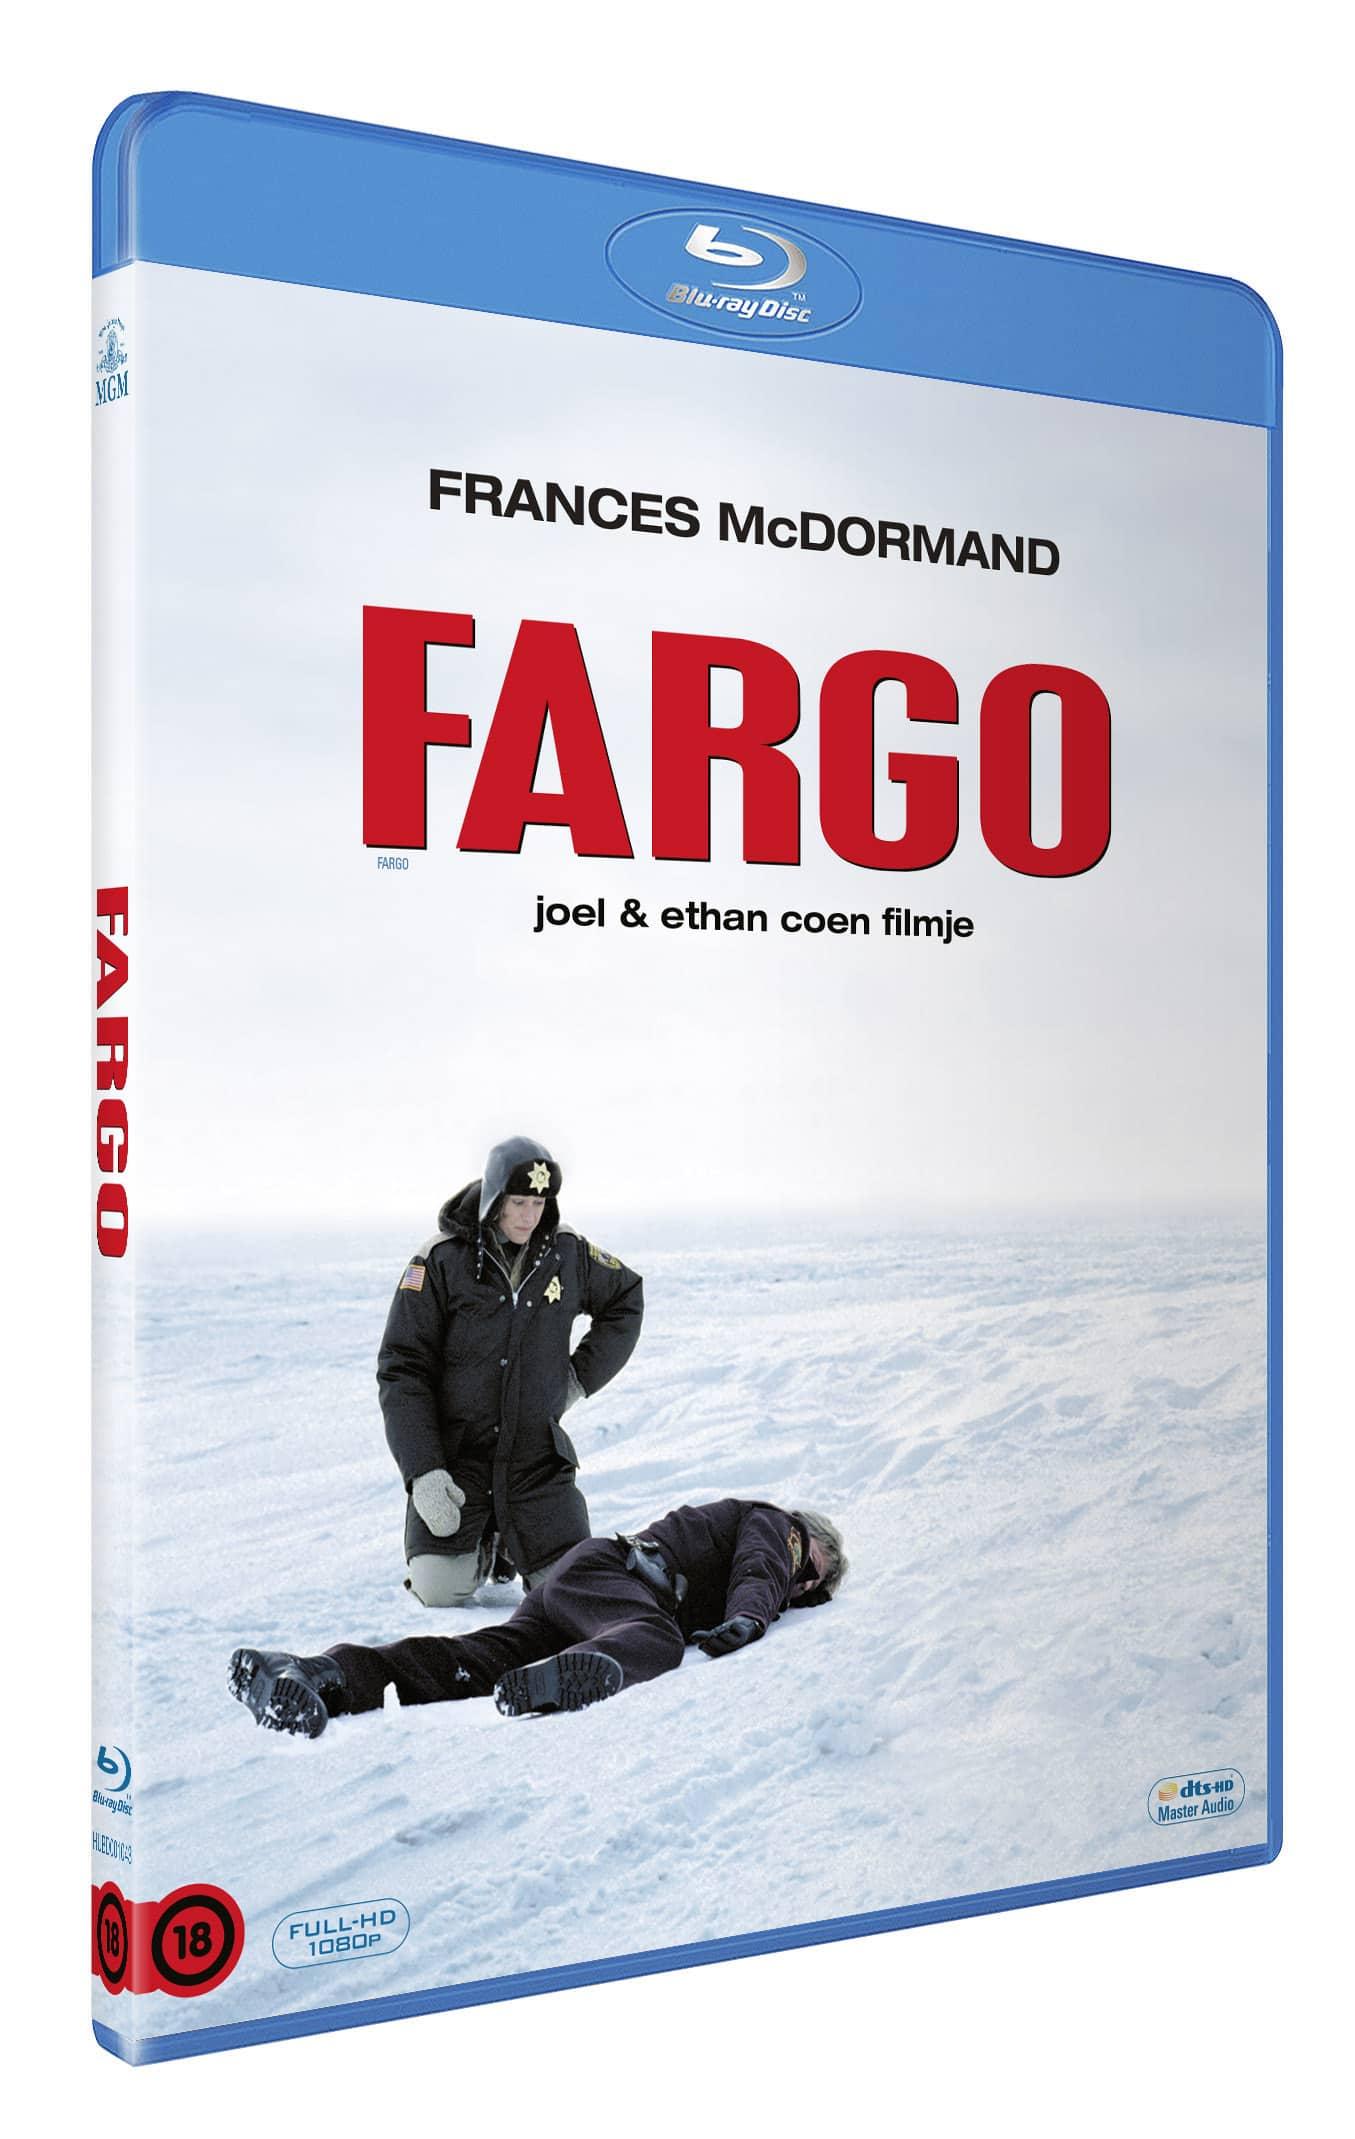 Fargo - Blu-ray